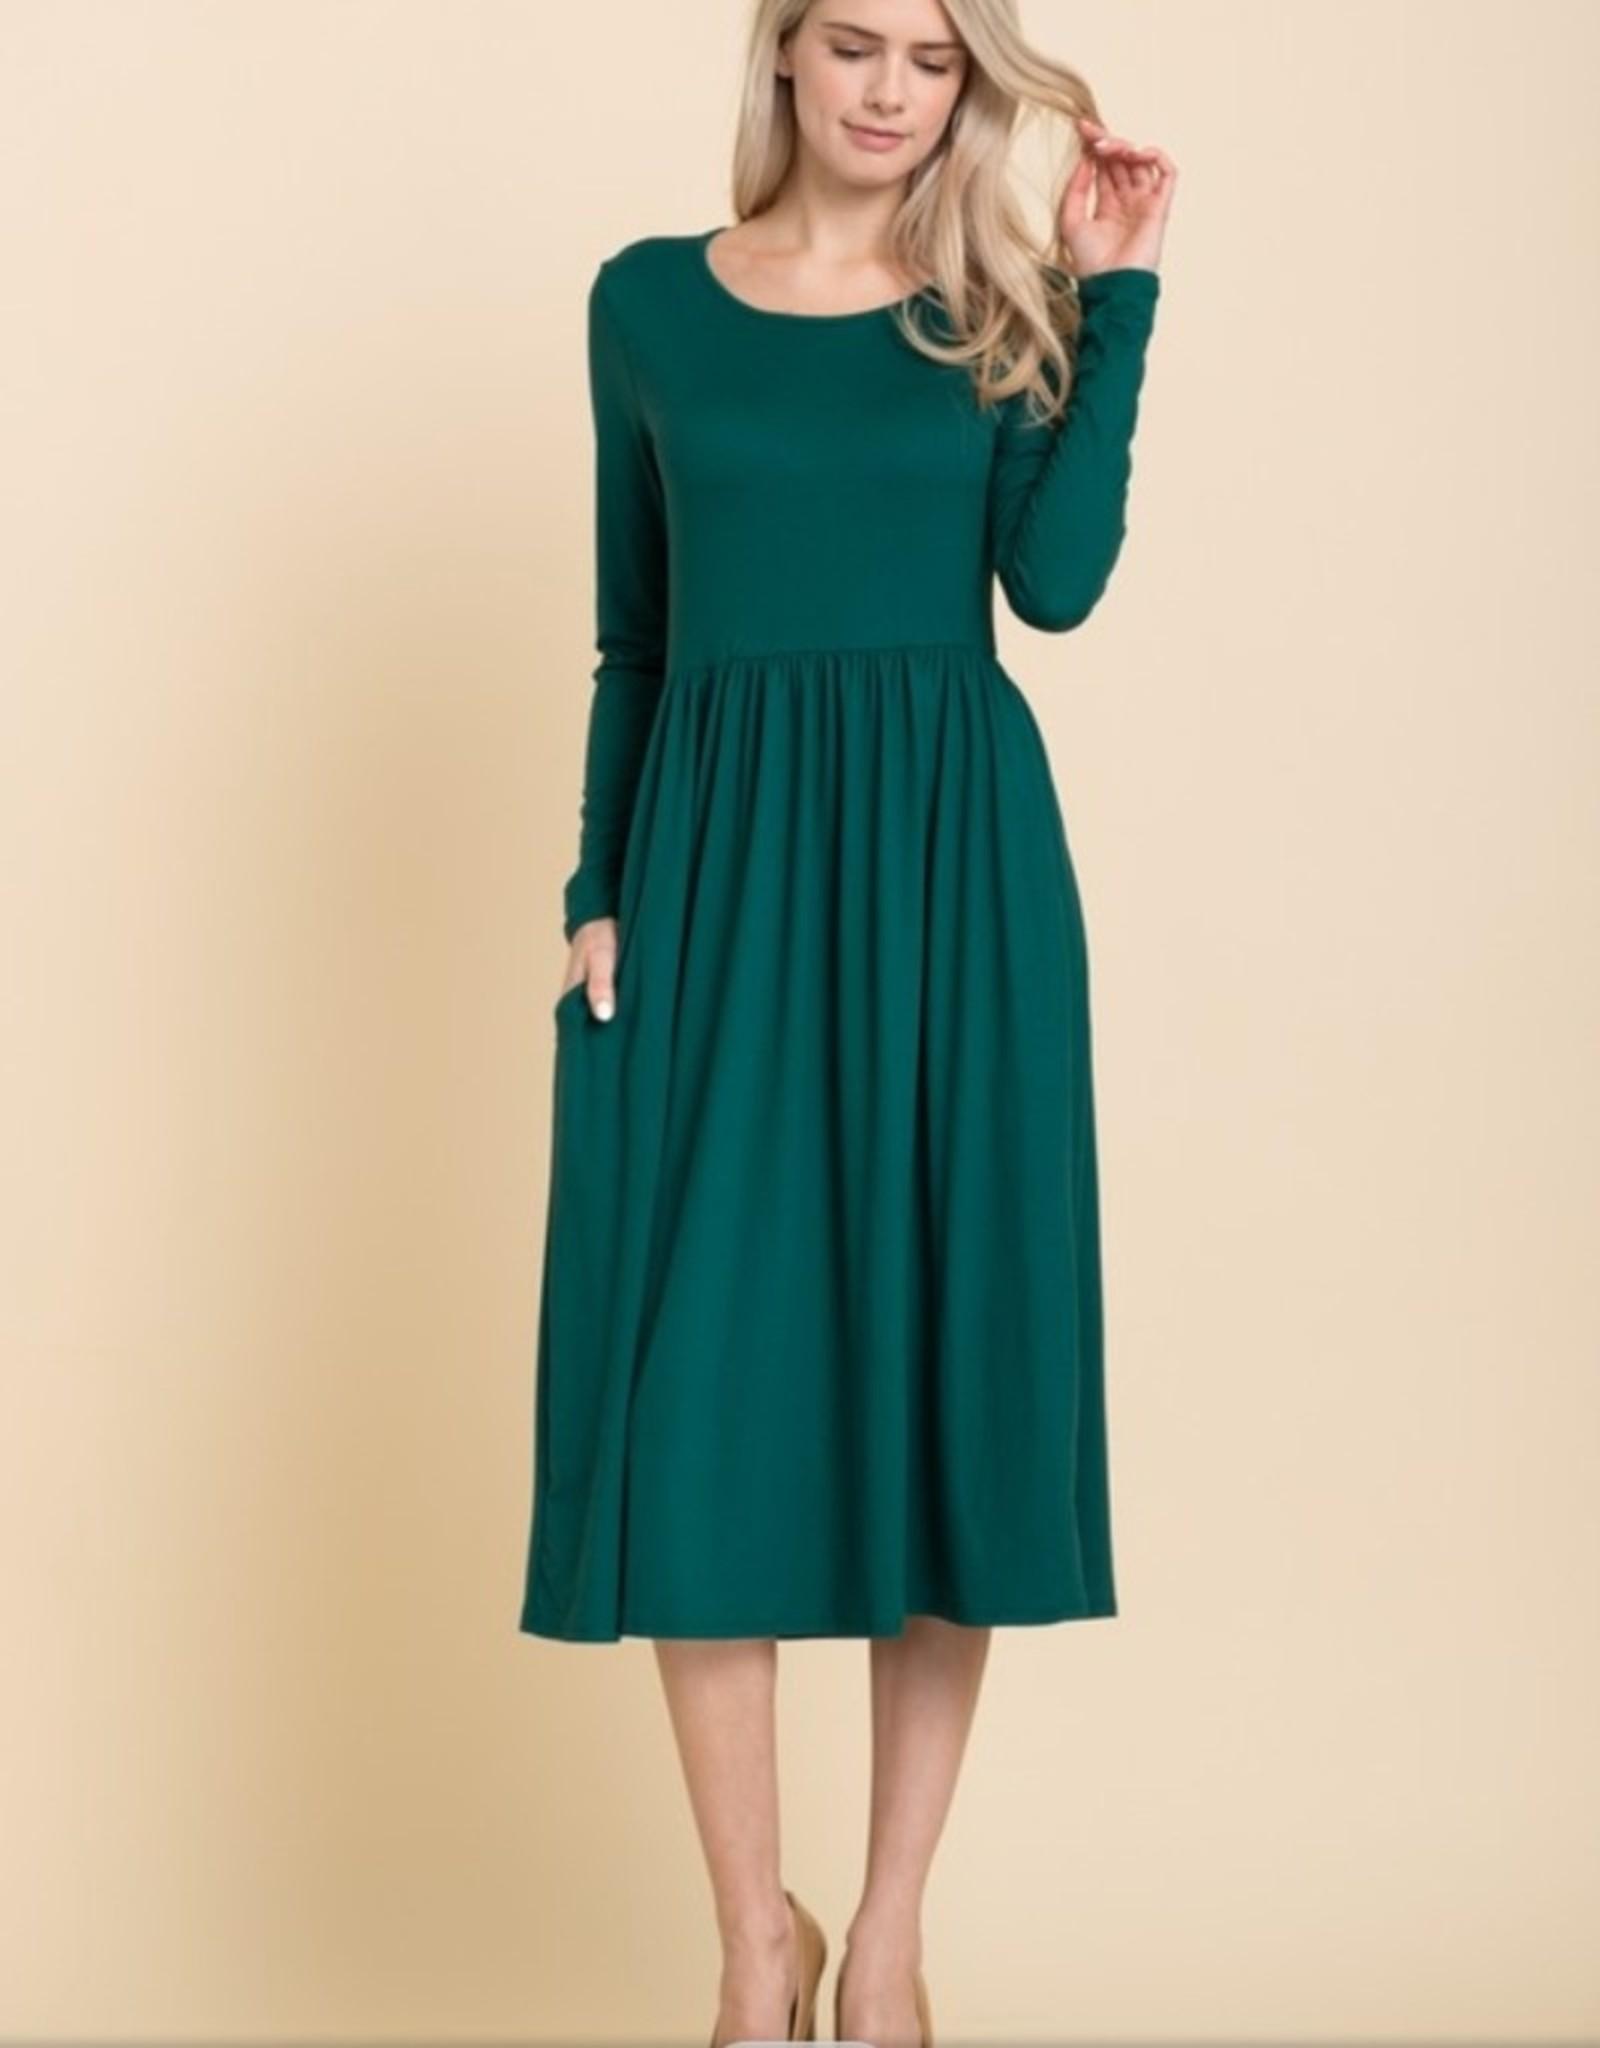 Reborn J long sleeve fit and flare midi dress